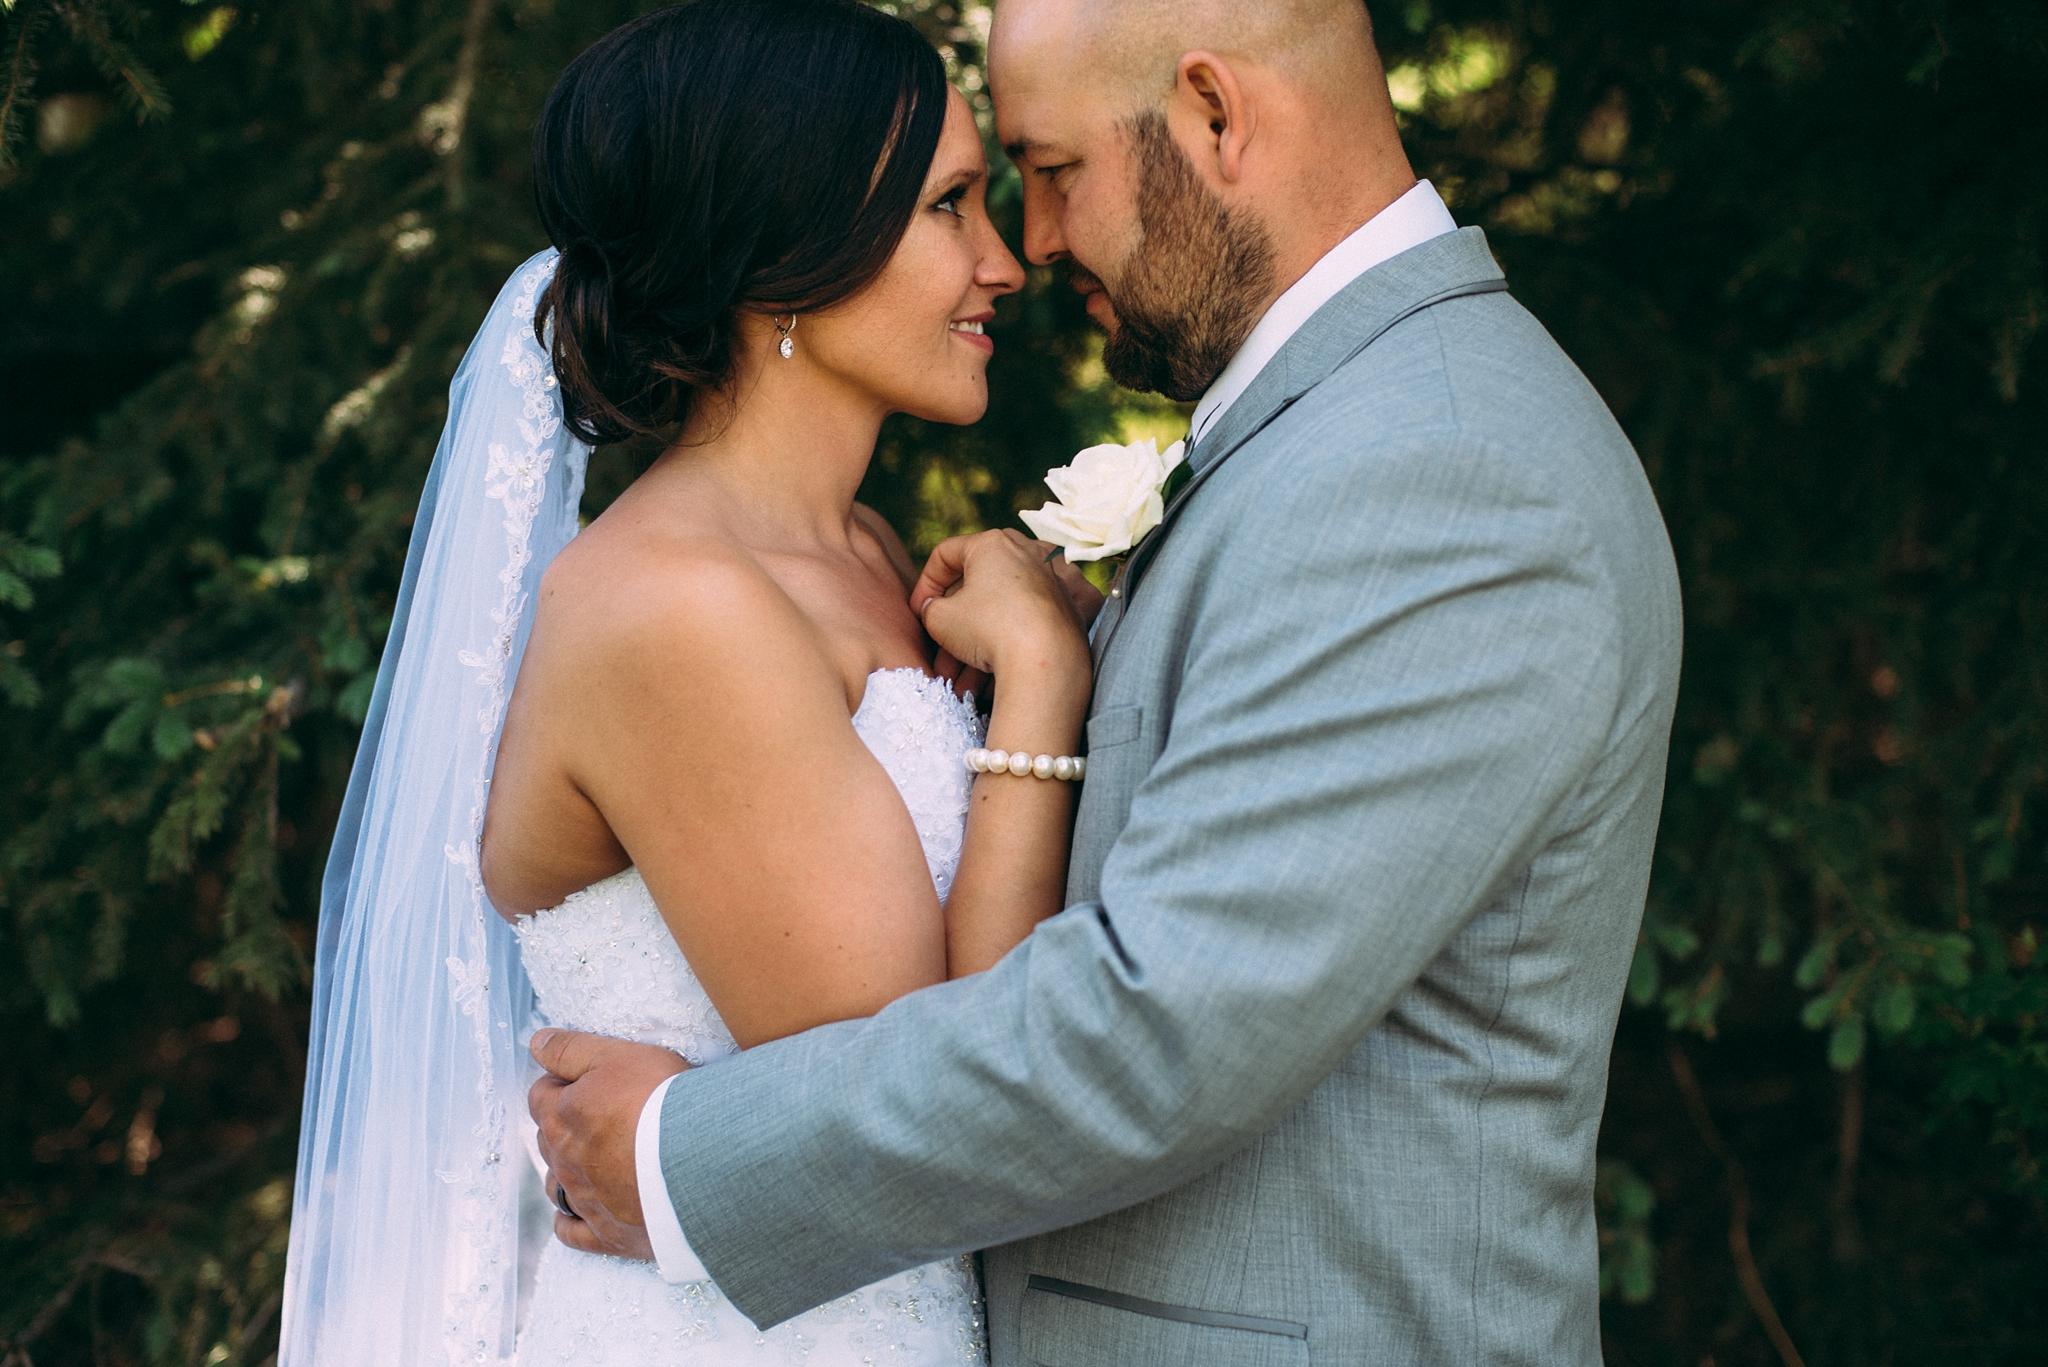 kaihla_tonai_intimate_wedding_elopement_photographer_1548